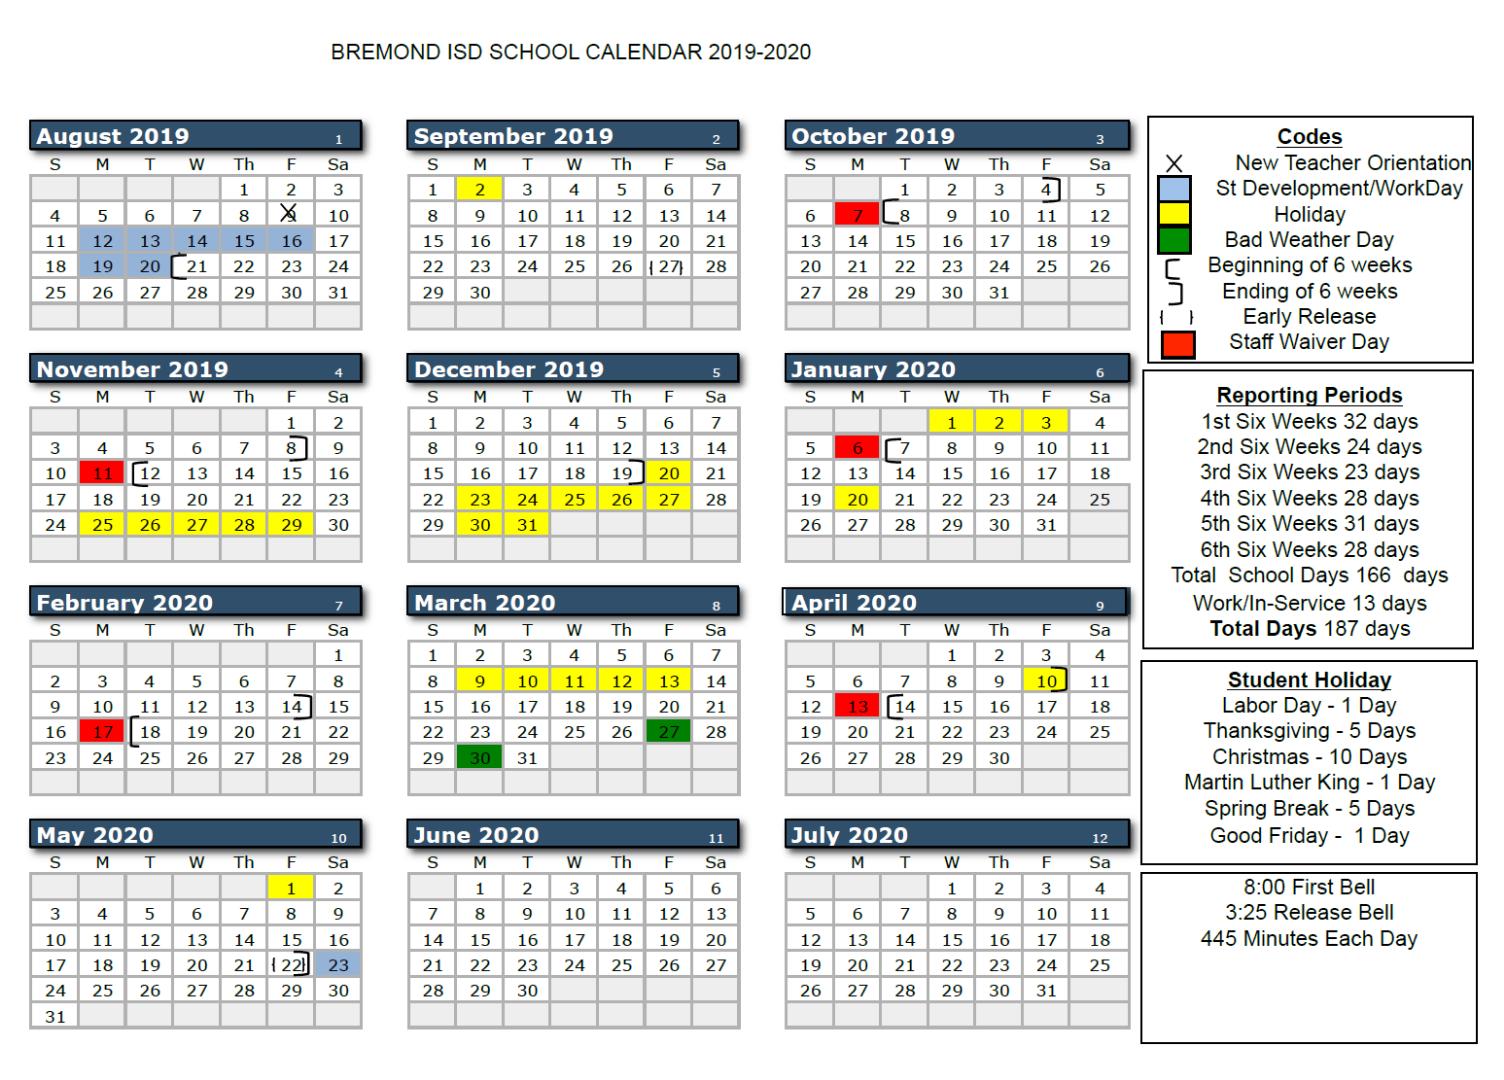 Bremond Isd - 2019 2020 Bisd School Calendar Regarding Brownsville Isd Academic Calendar